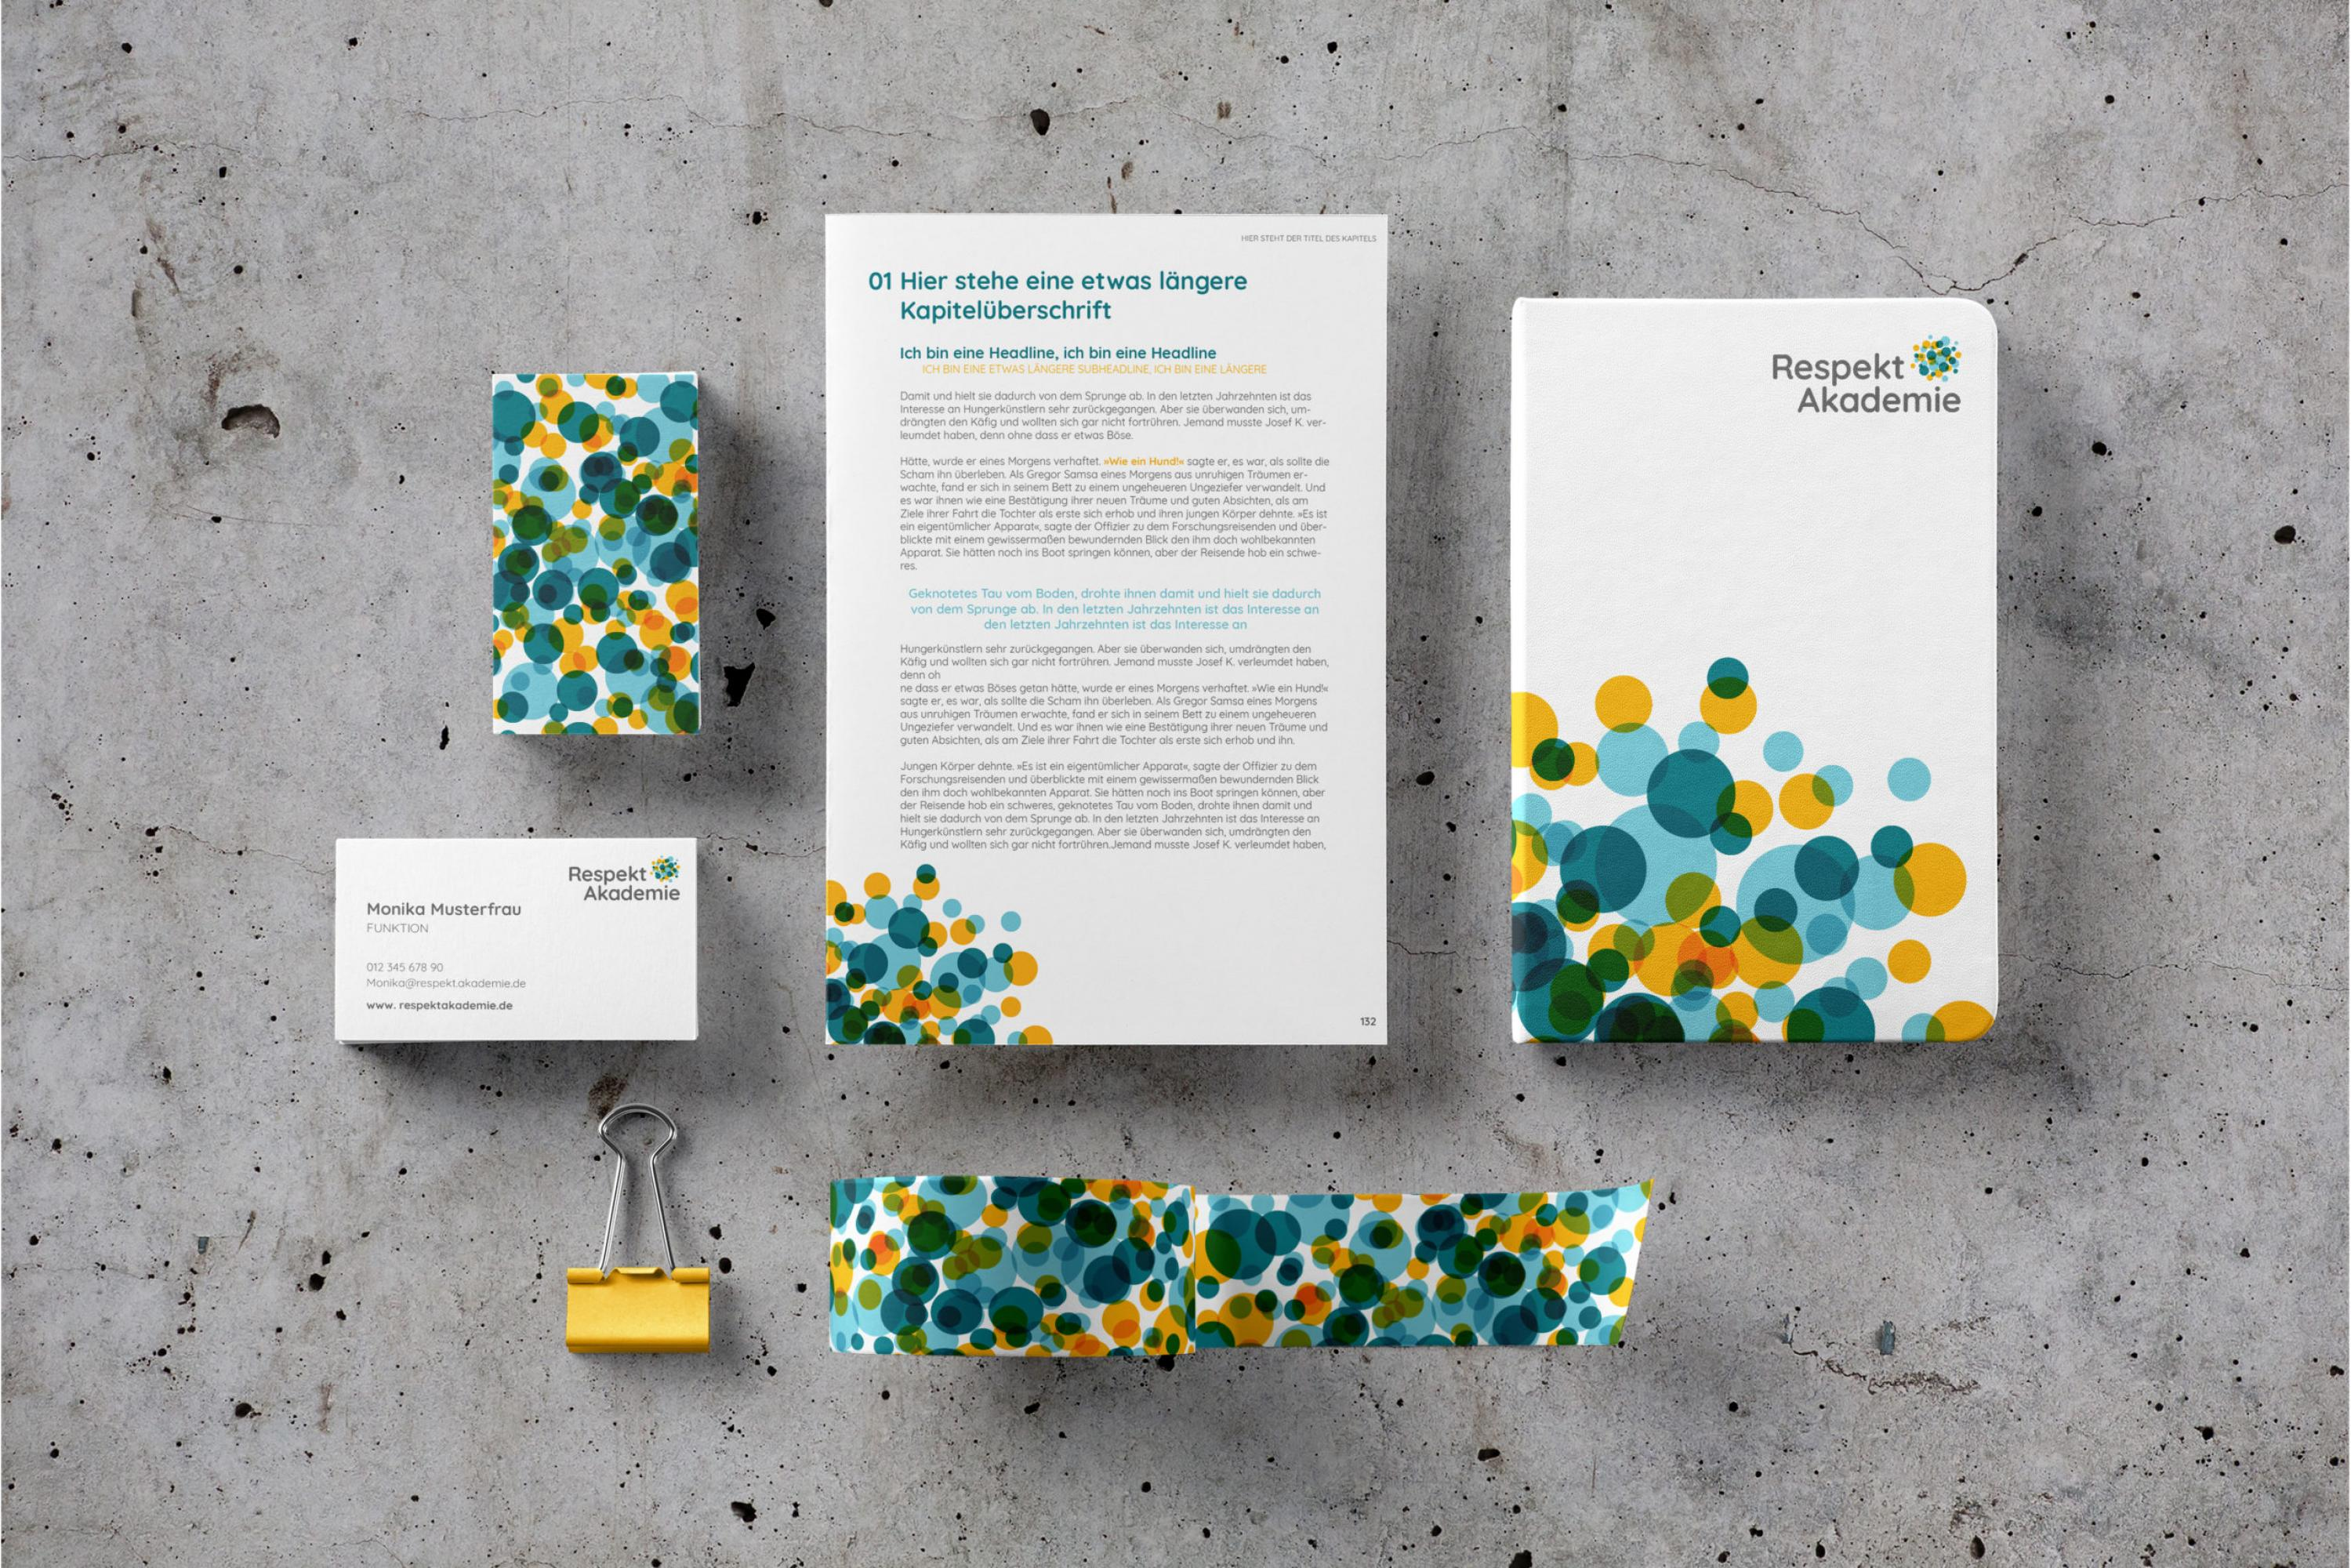 Corporate-Design-ResepektAkademie-Logo-FORMLOS-Berlin